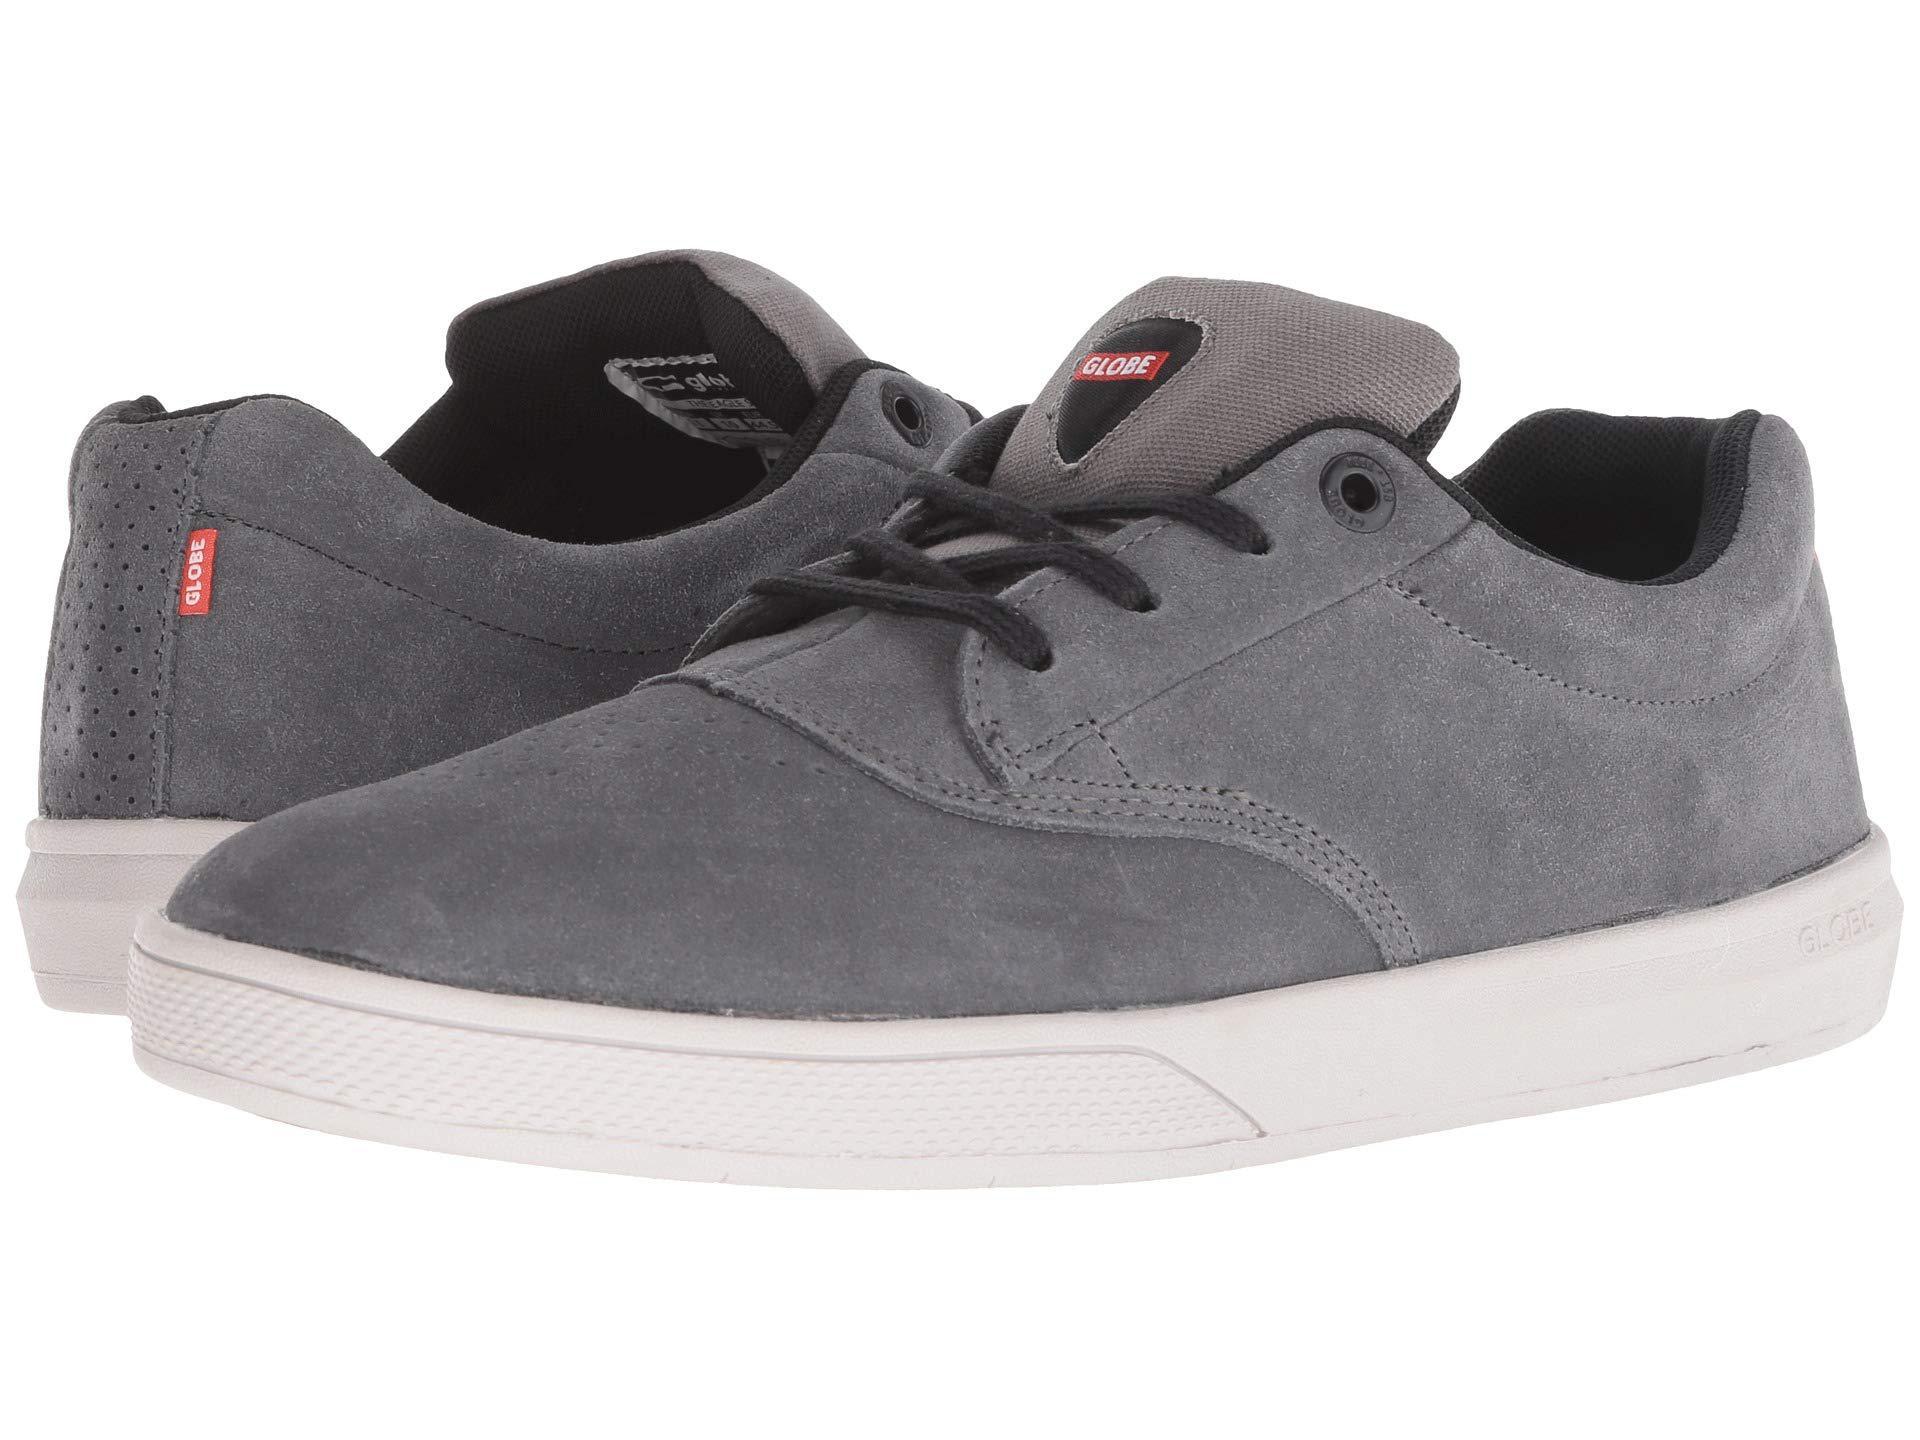 d02e8c7c83 Globe - Gray The Eagle Sg (charcoal grey) Men s Skate Shoes for Men. View  fullscreen